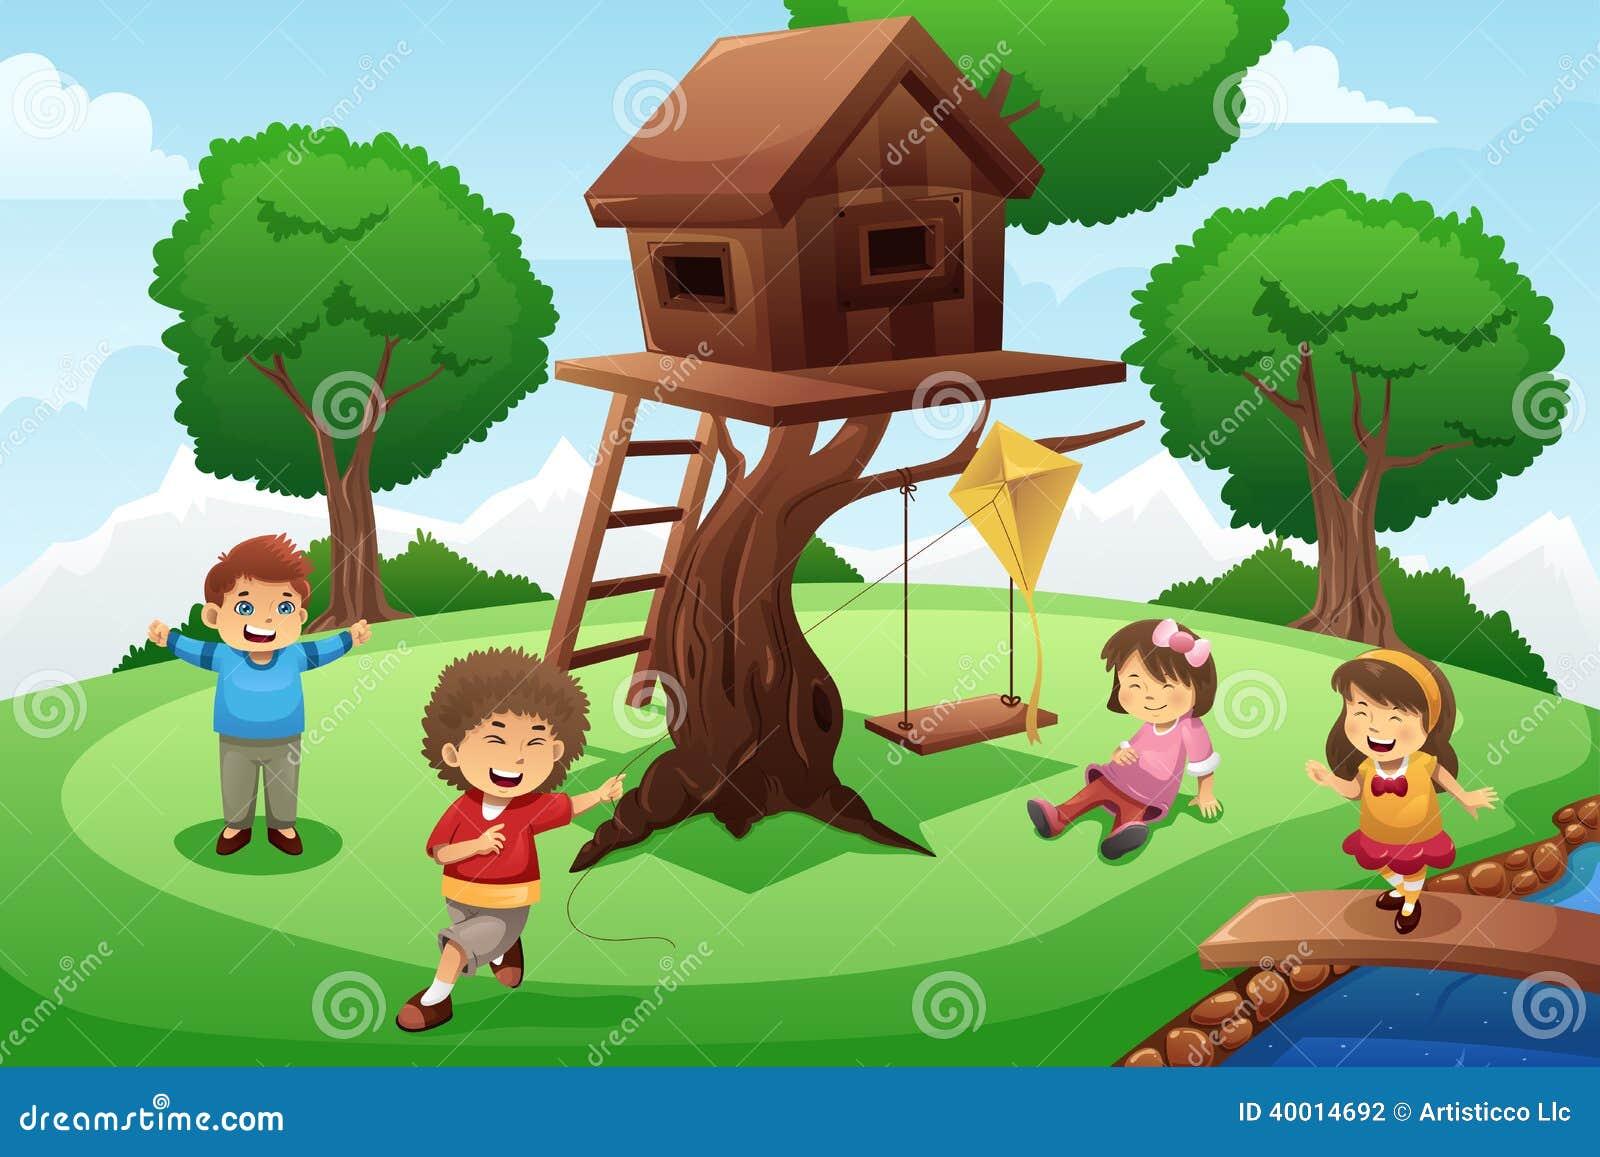 Kids Playing Around Tree House Stock Vector Image 40014692